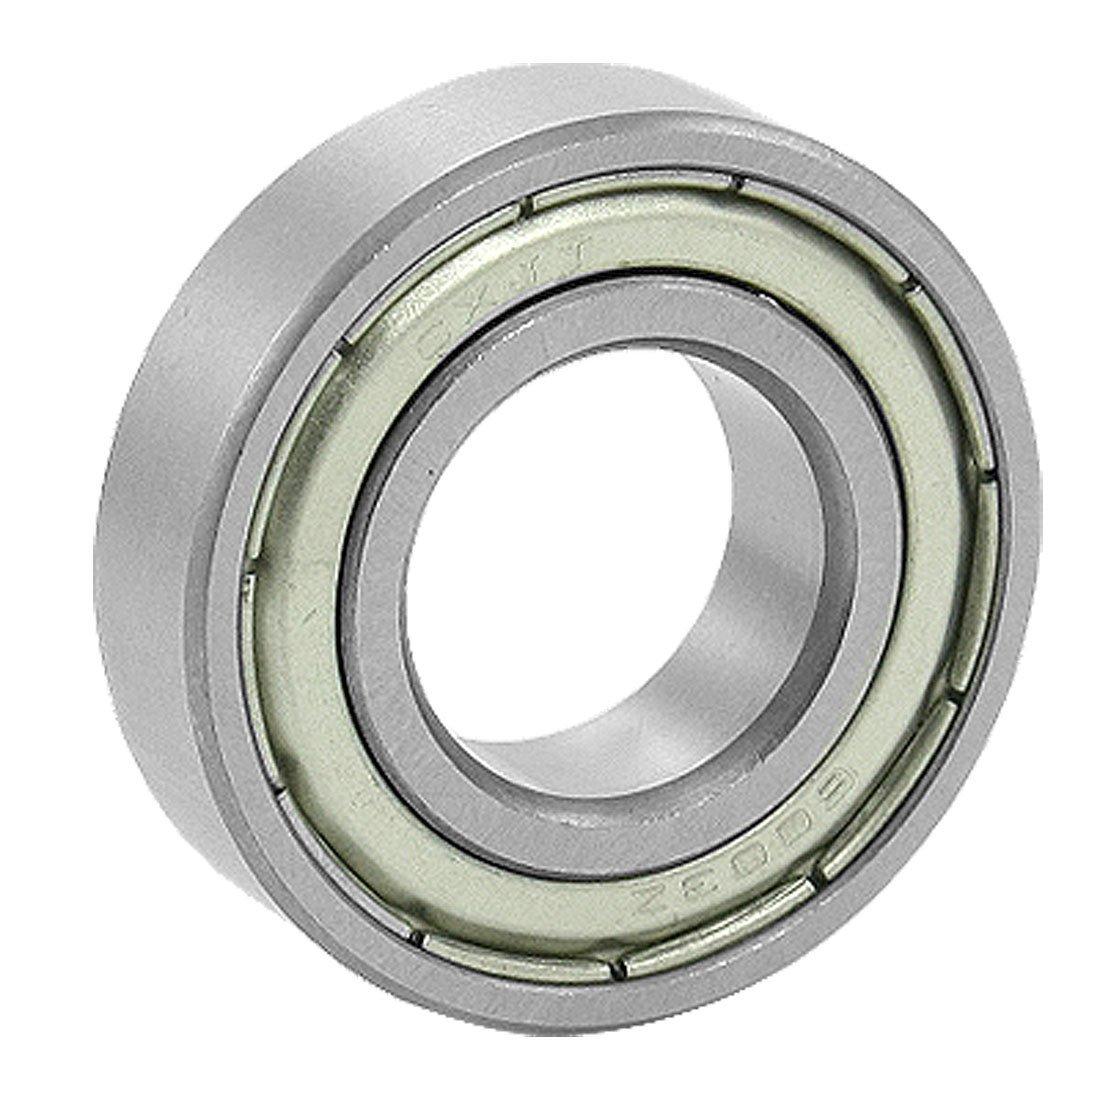 faaj 10 Pcs 6003z Single Row Shielded Deep Groove Ball Bearings 17x35x10mm Frugal 3 Pcs Of Latest Technology